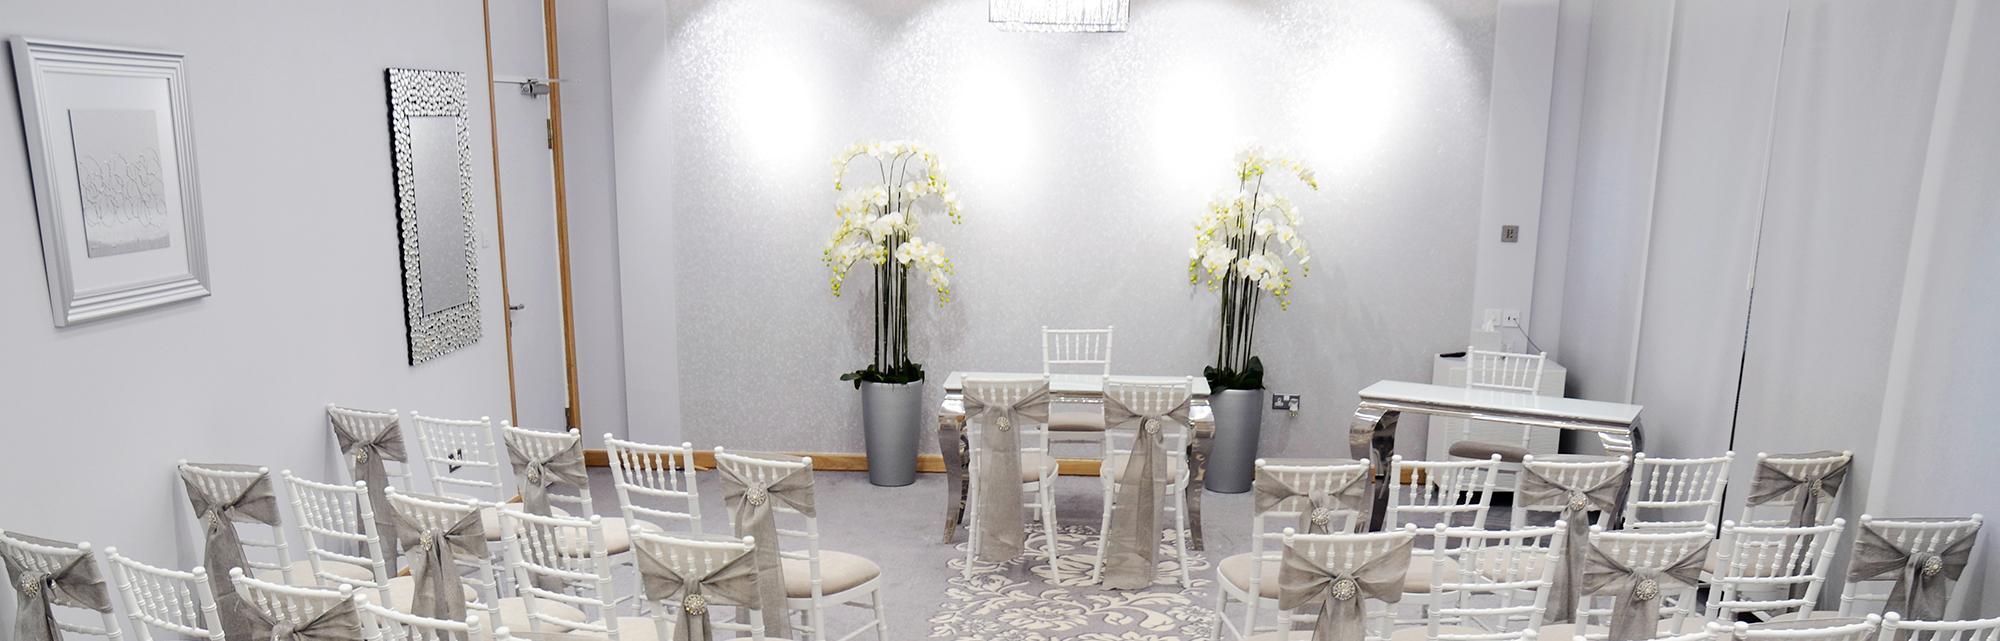 Tyne Suite wedding ceremony venue, Gateshead